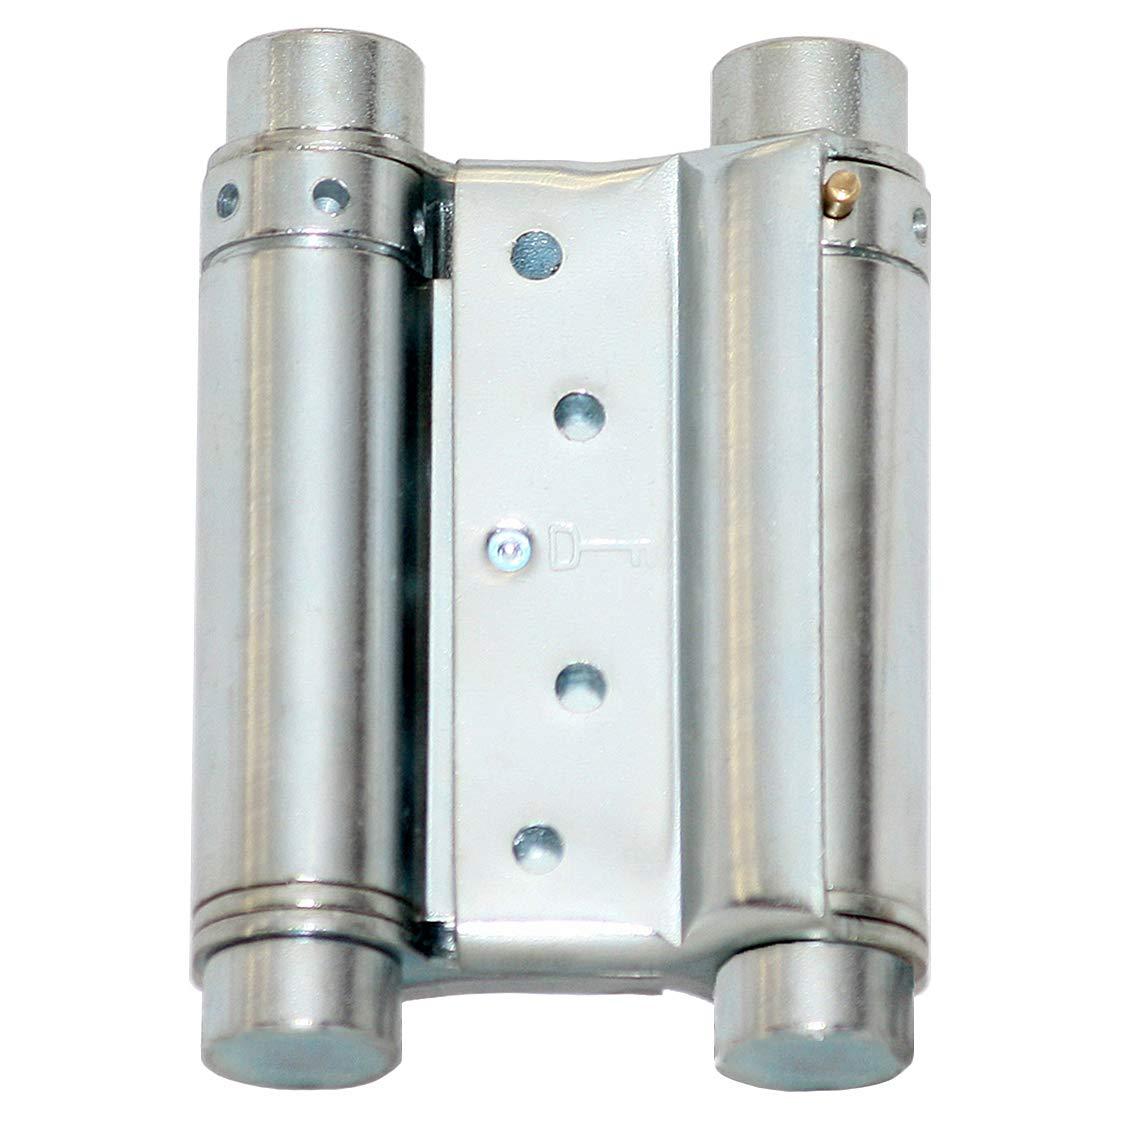 Pendelt/ürband beidseitig 75 mm Pendelt/ürscharnier Schwingt/ür T/ürband Silber V.